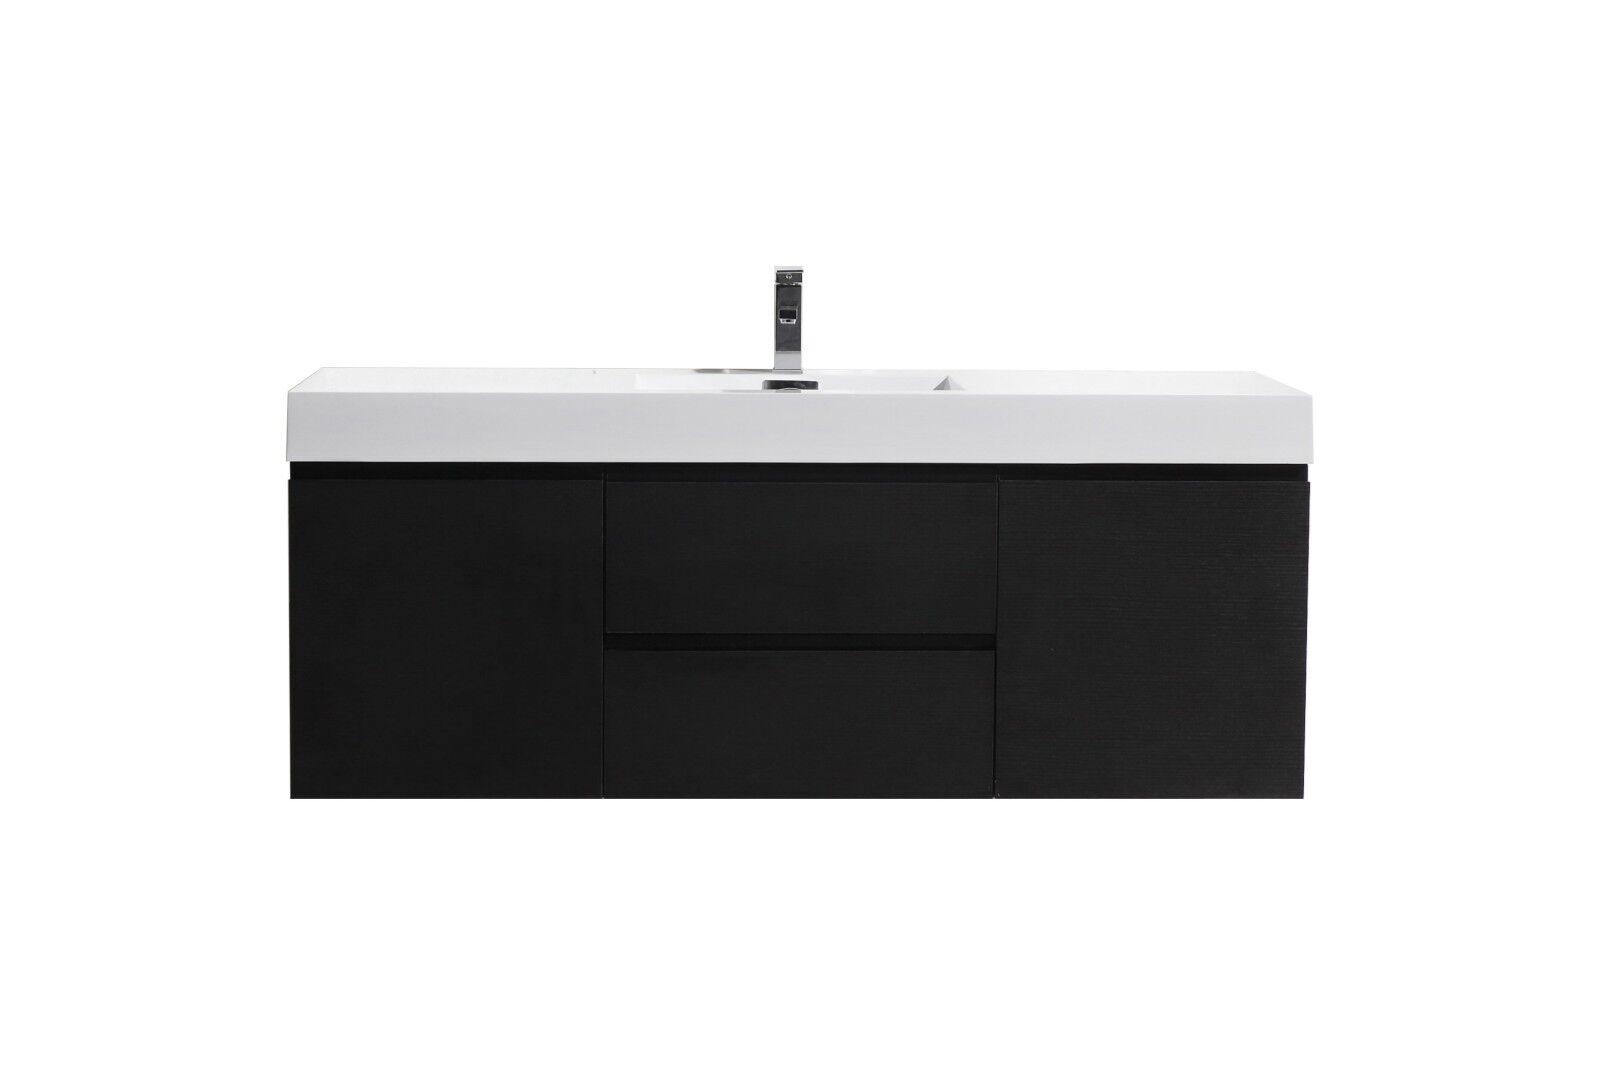 Moreno Bath 60 Bathroom Vanity Wall Mount Single Sink Black Cabinet For Sale Online